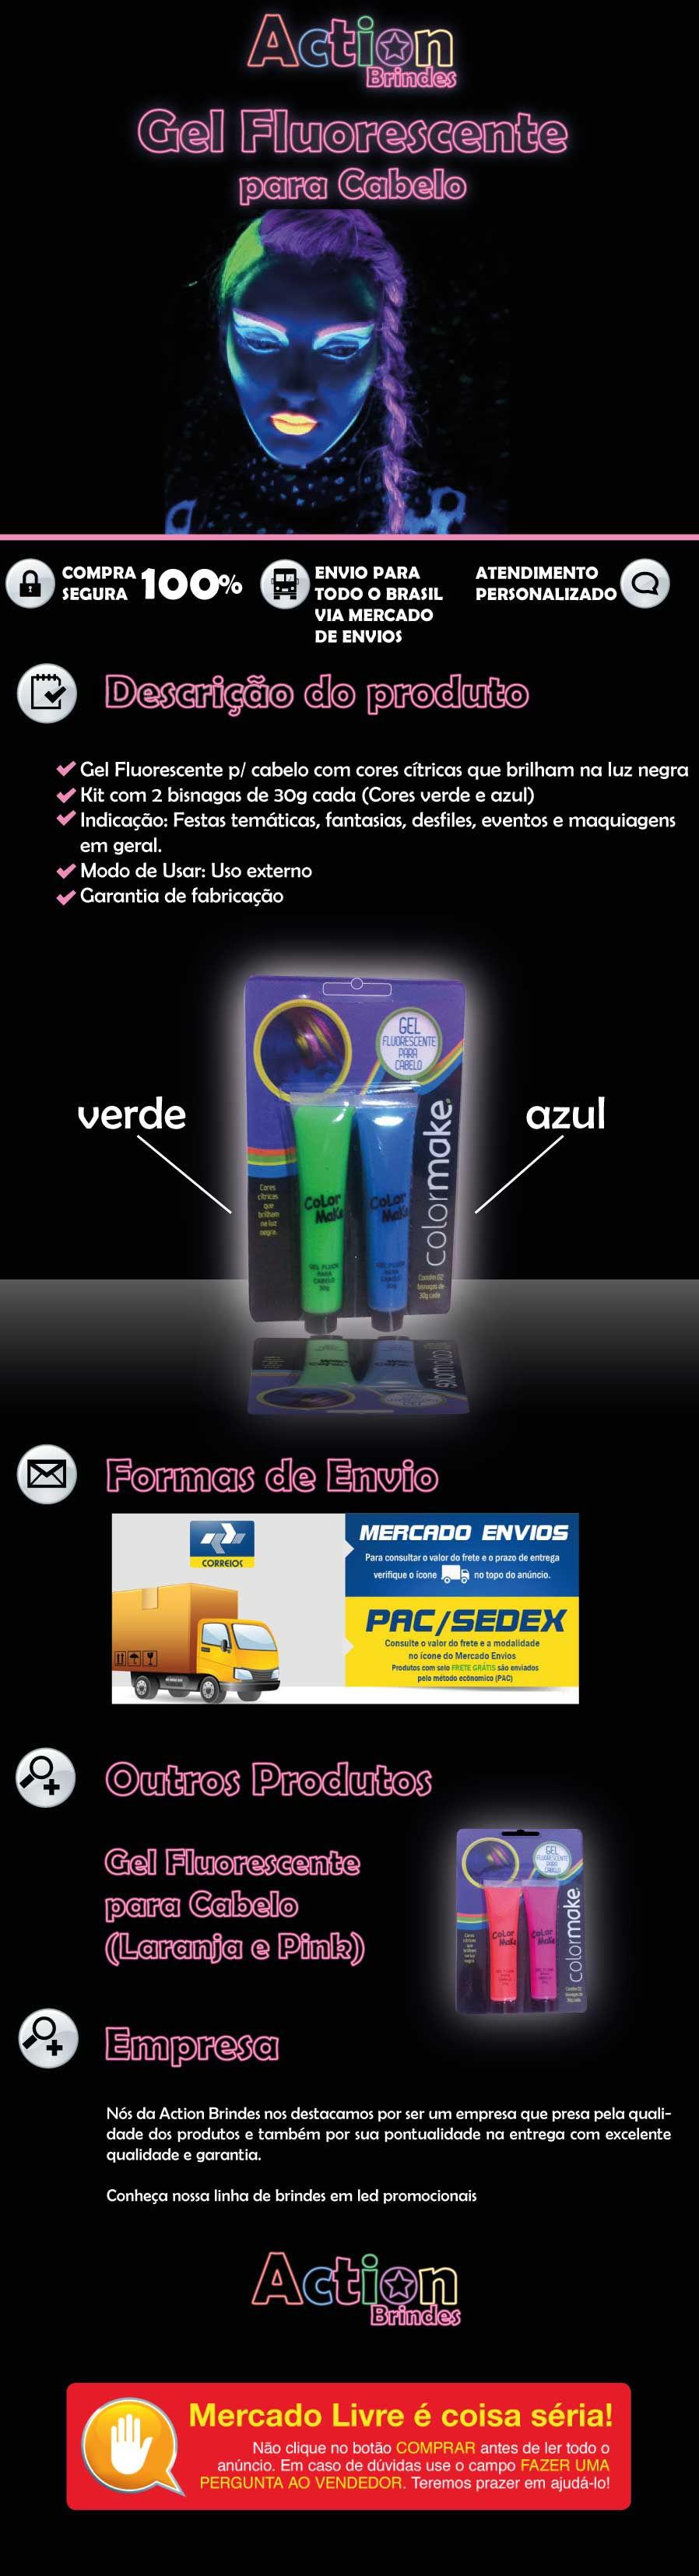 Gel Fluorescente Para Cabelo Verde e Azul